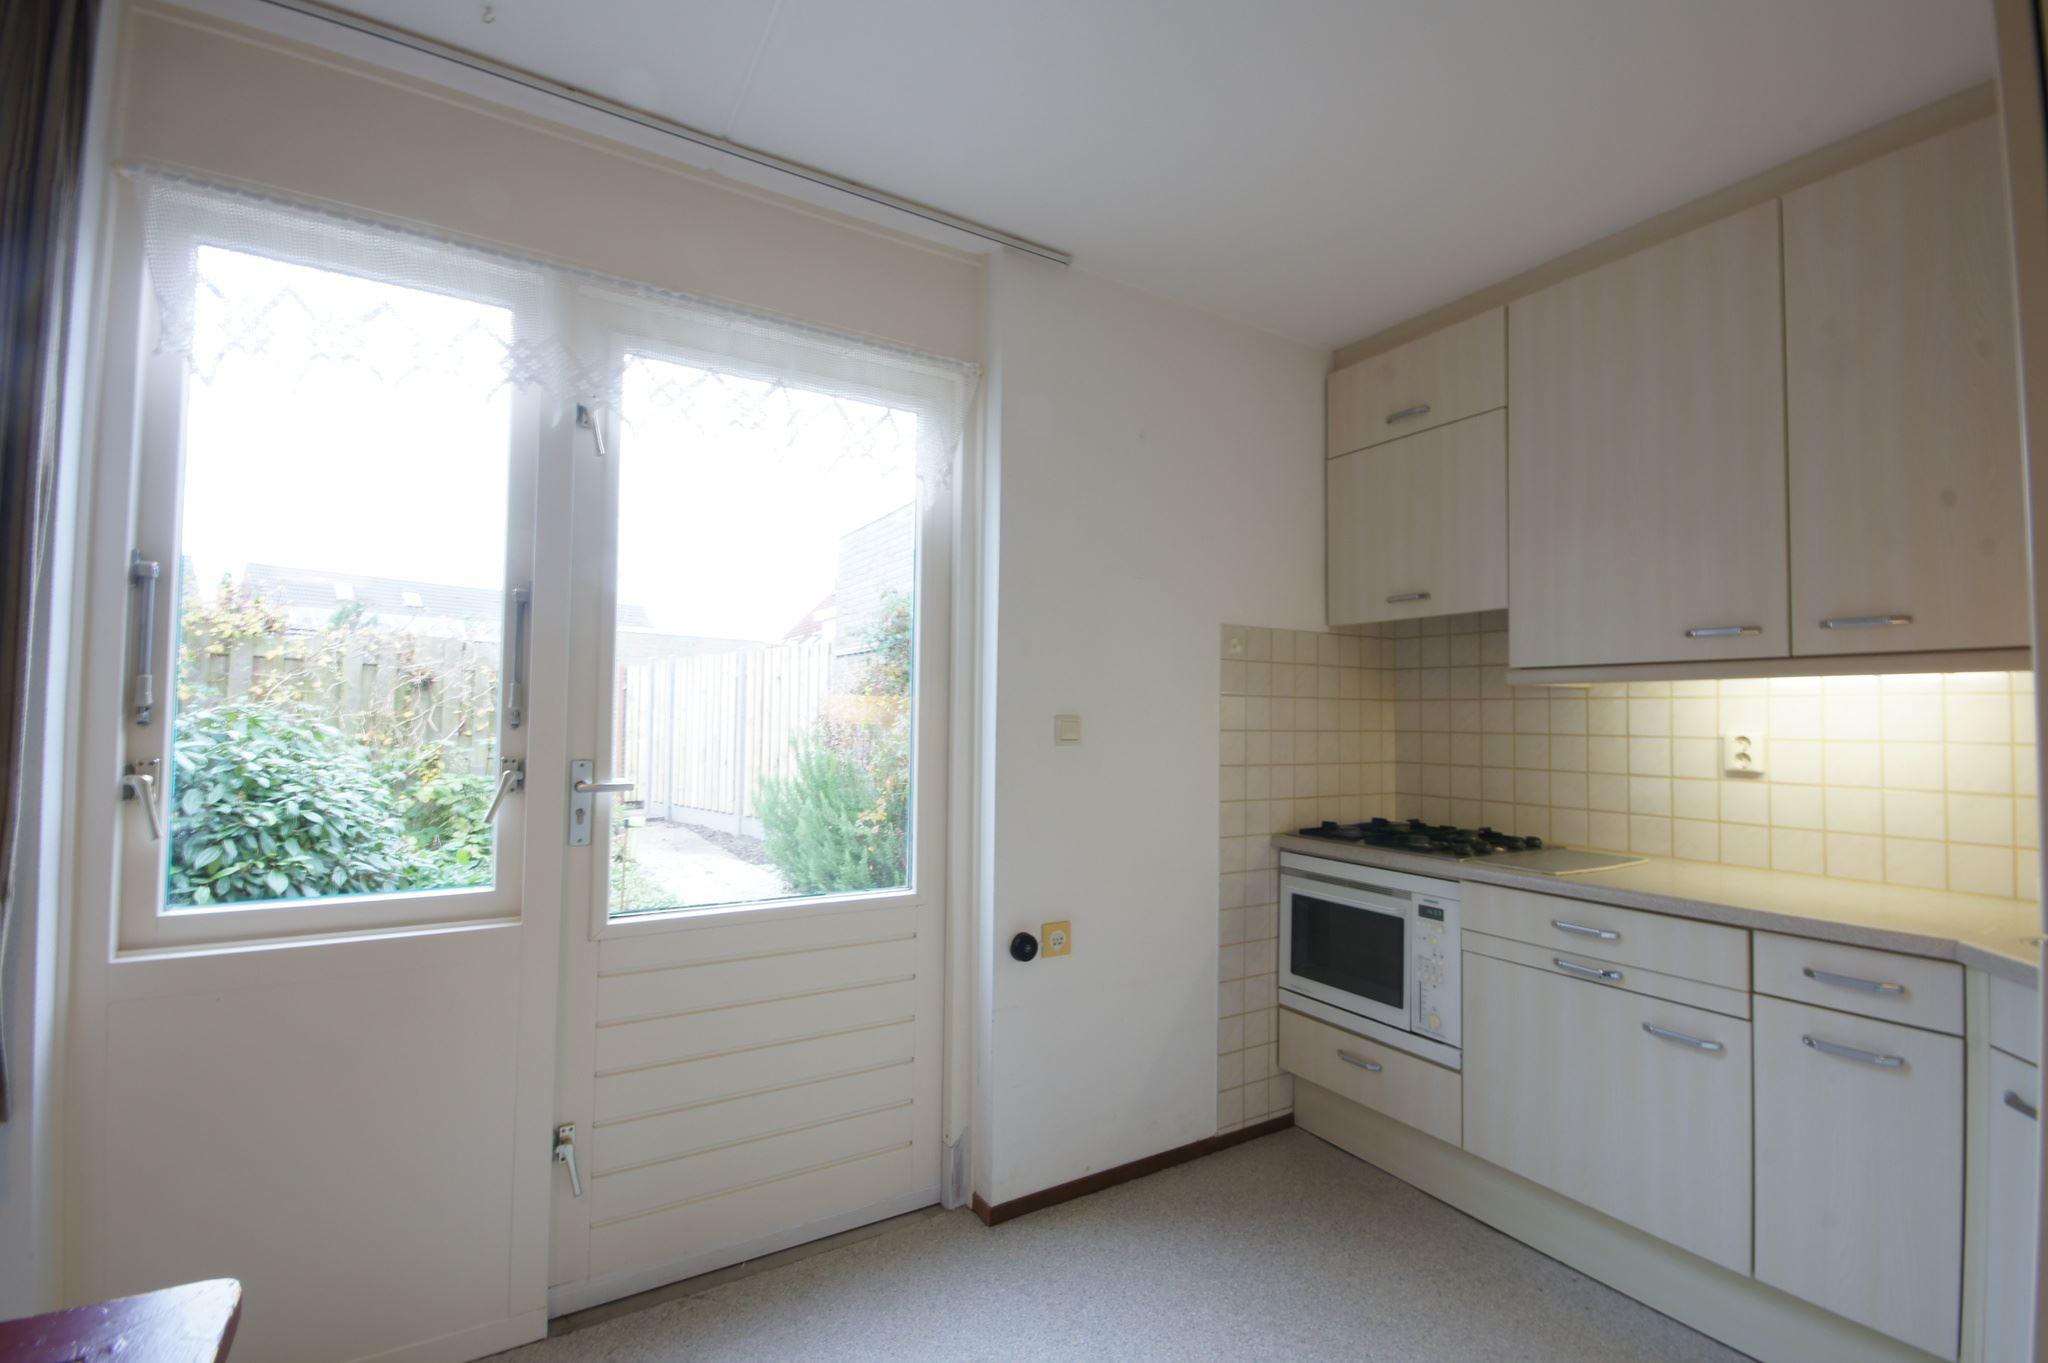 Keukens Oude Tonge : Huis te koop Rooseveltstraat 27 3255 XK Oude Tonge [funda]